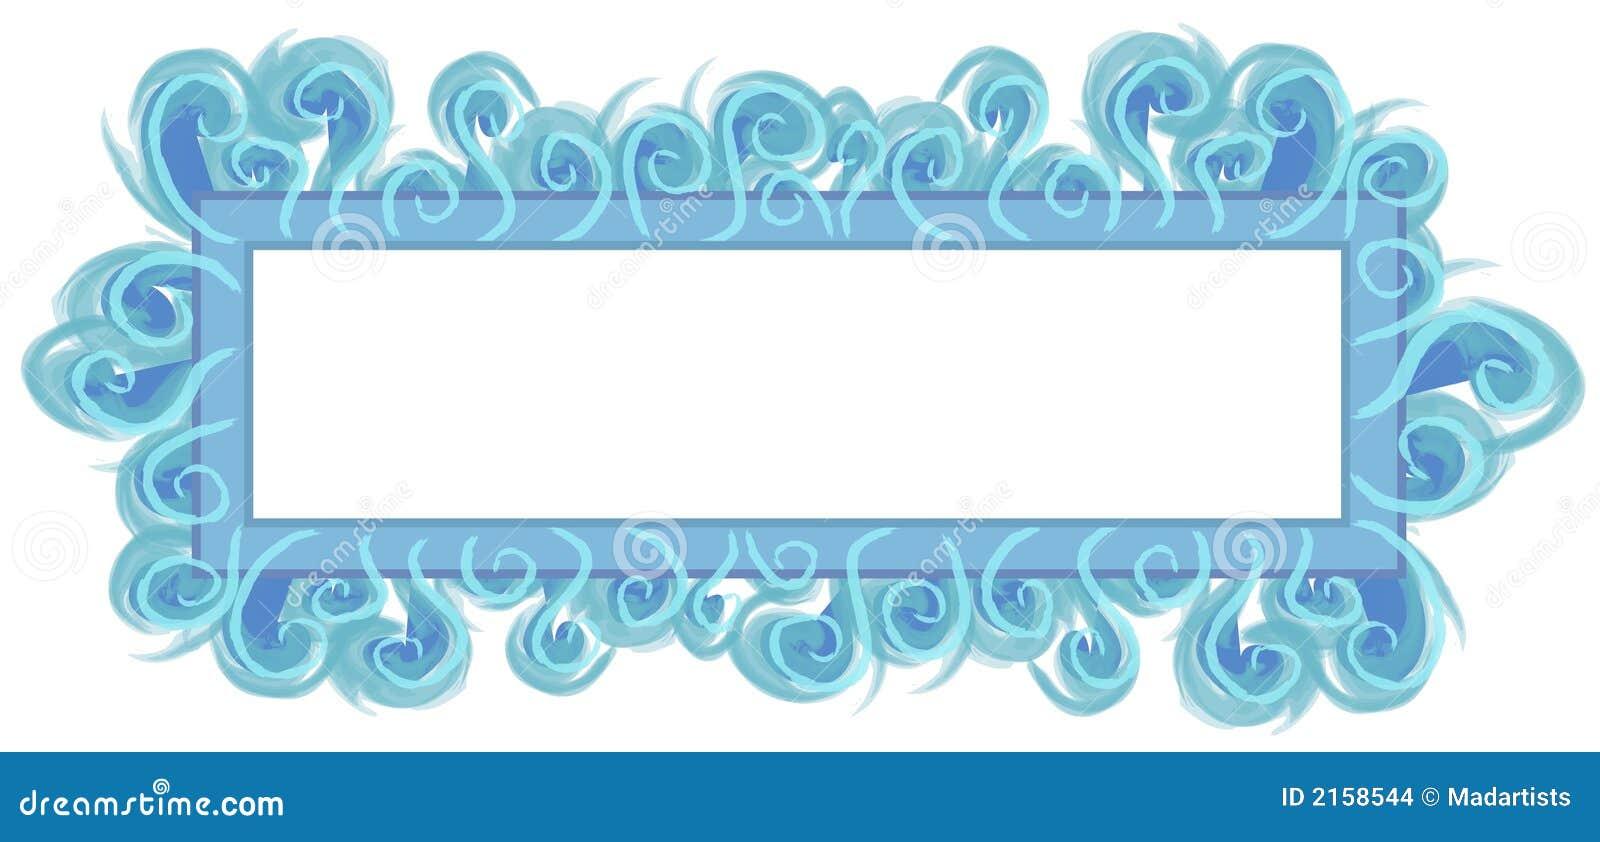 webpage layout template